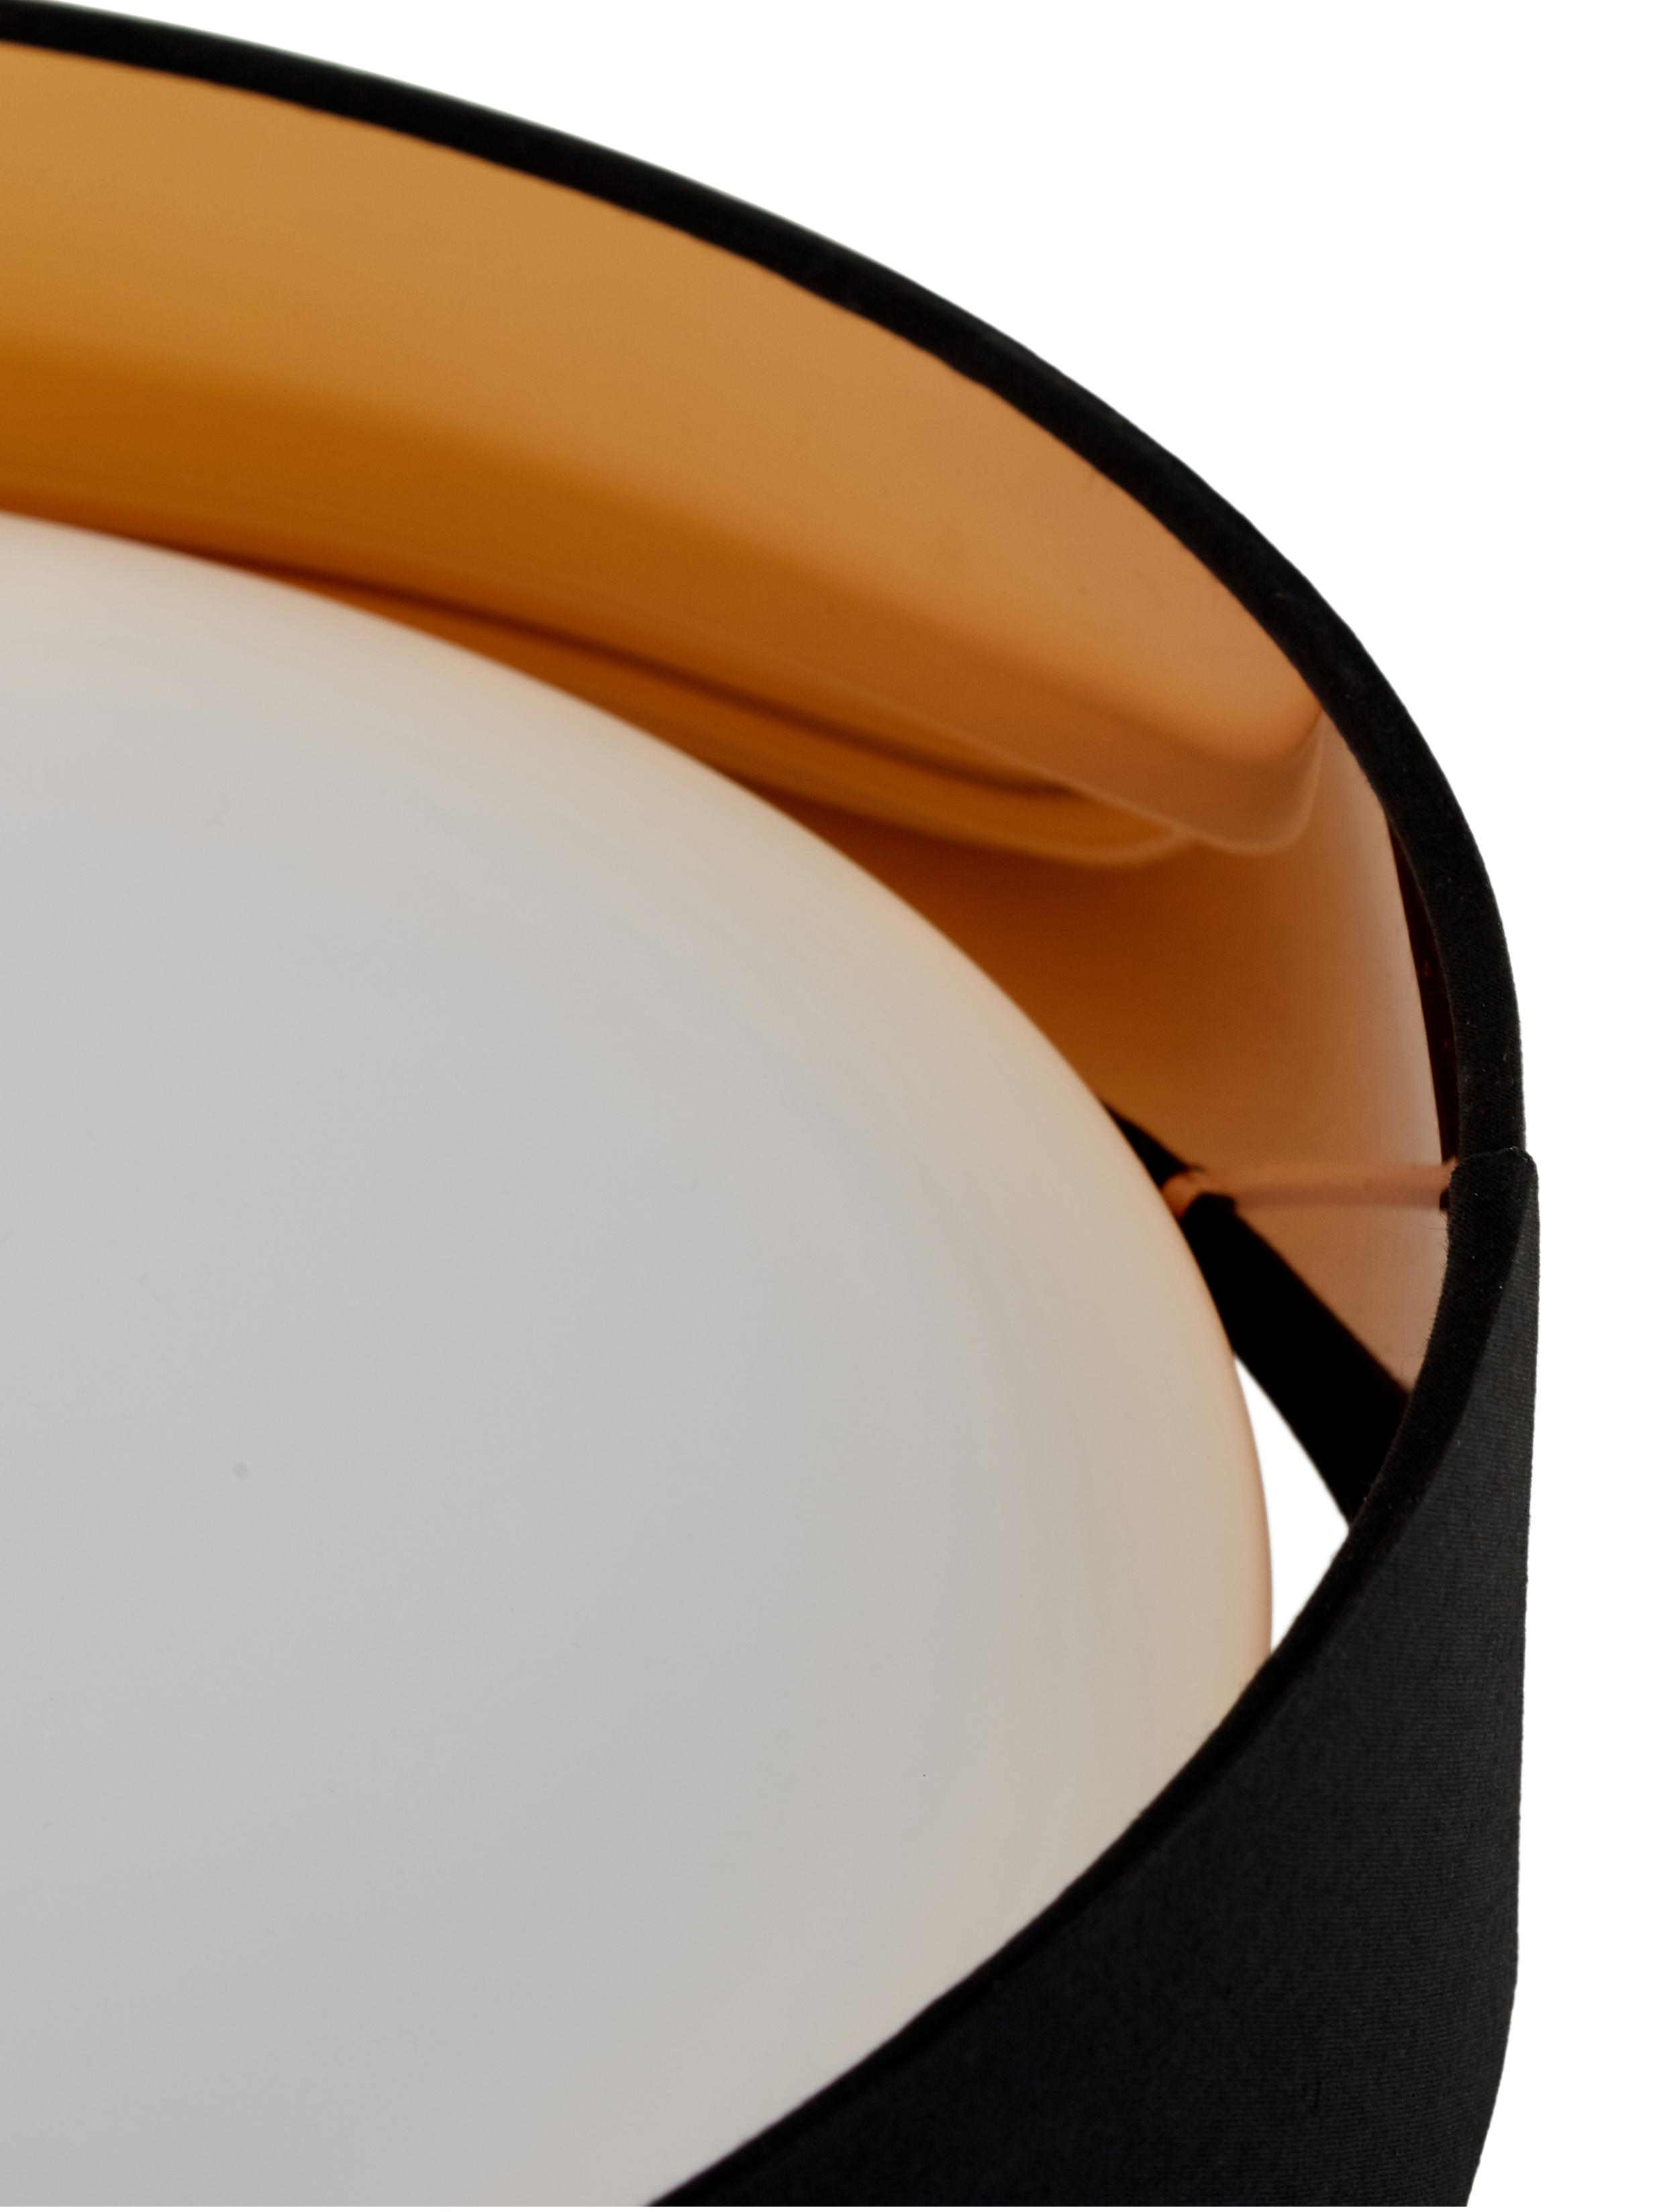 LED plafondlamp Mallory, Frame: metaal, Diffuser: kunststof, Zwart, Ø 41 x H 10 cm